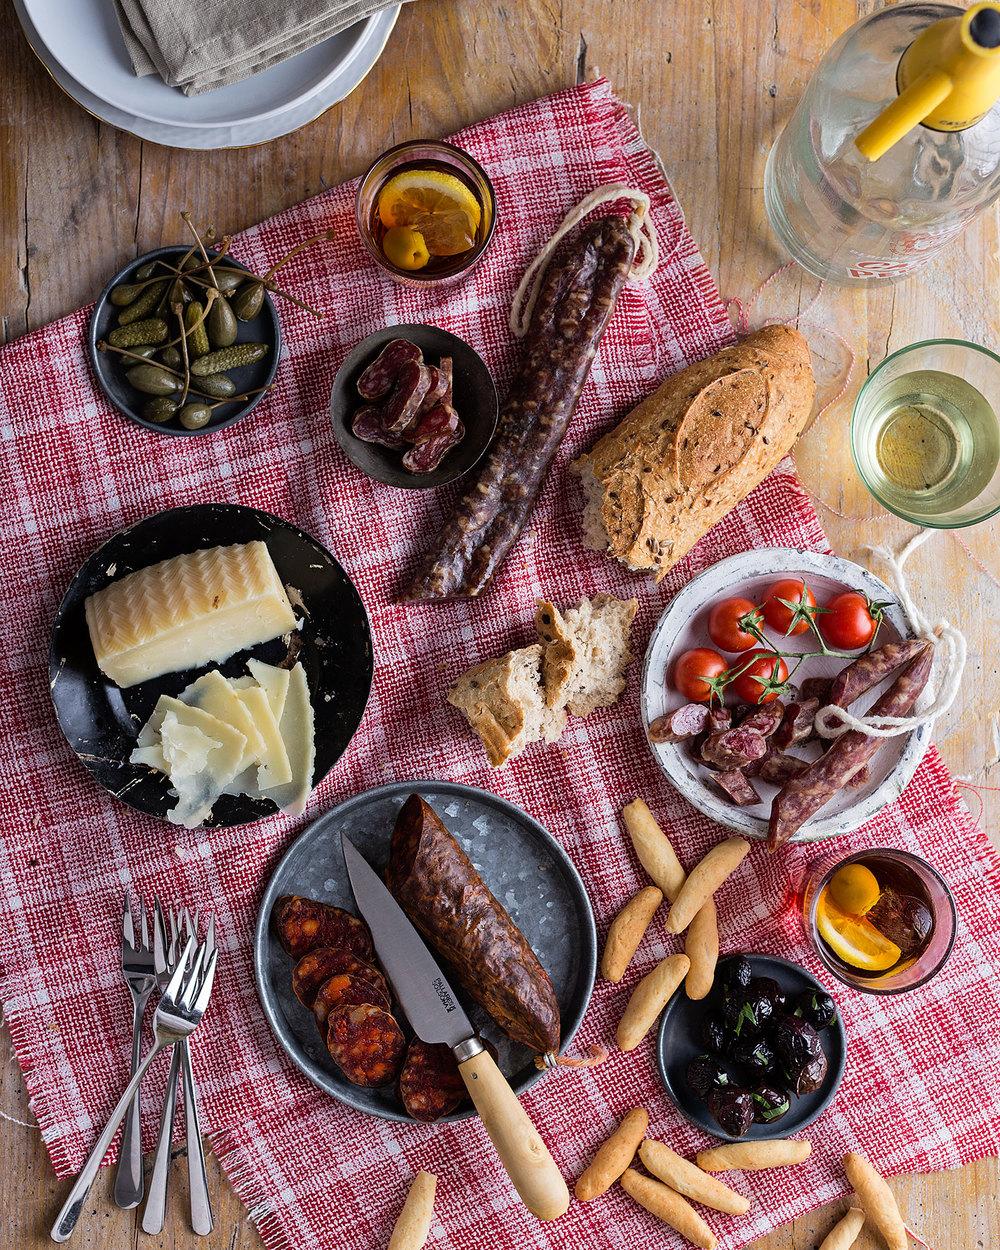 corina-landa-food-photography-fotografia-gastronomica-56.jpg